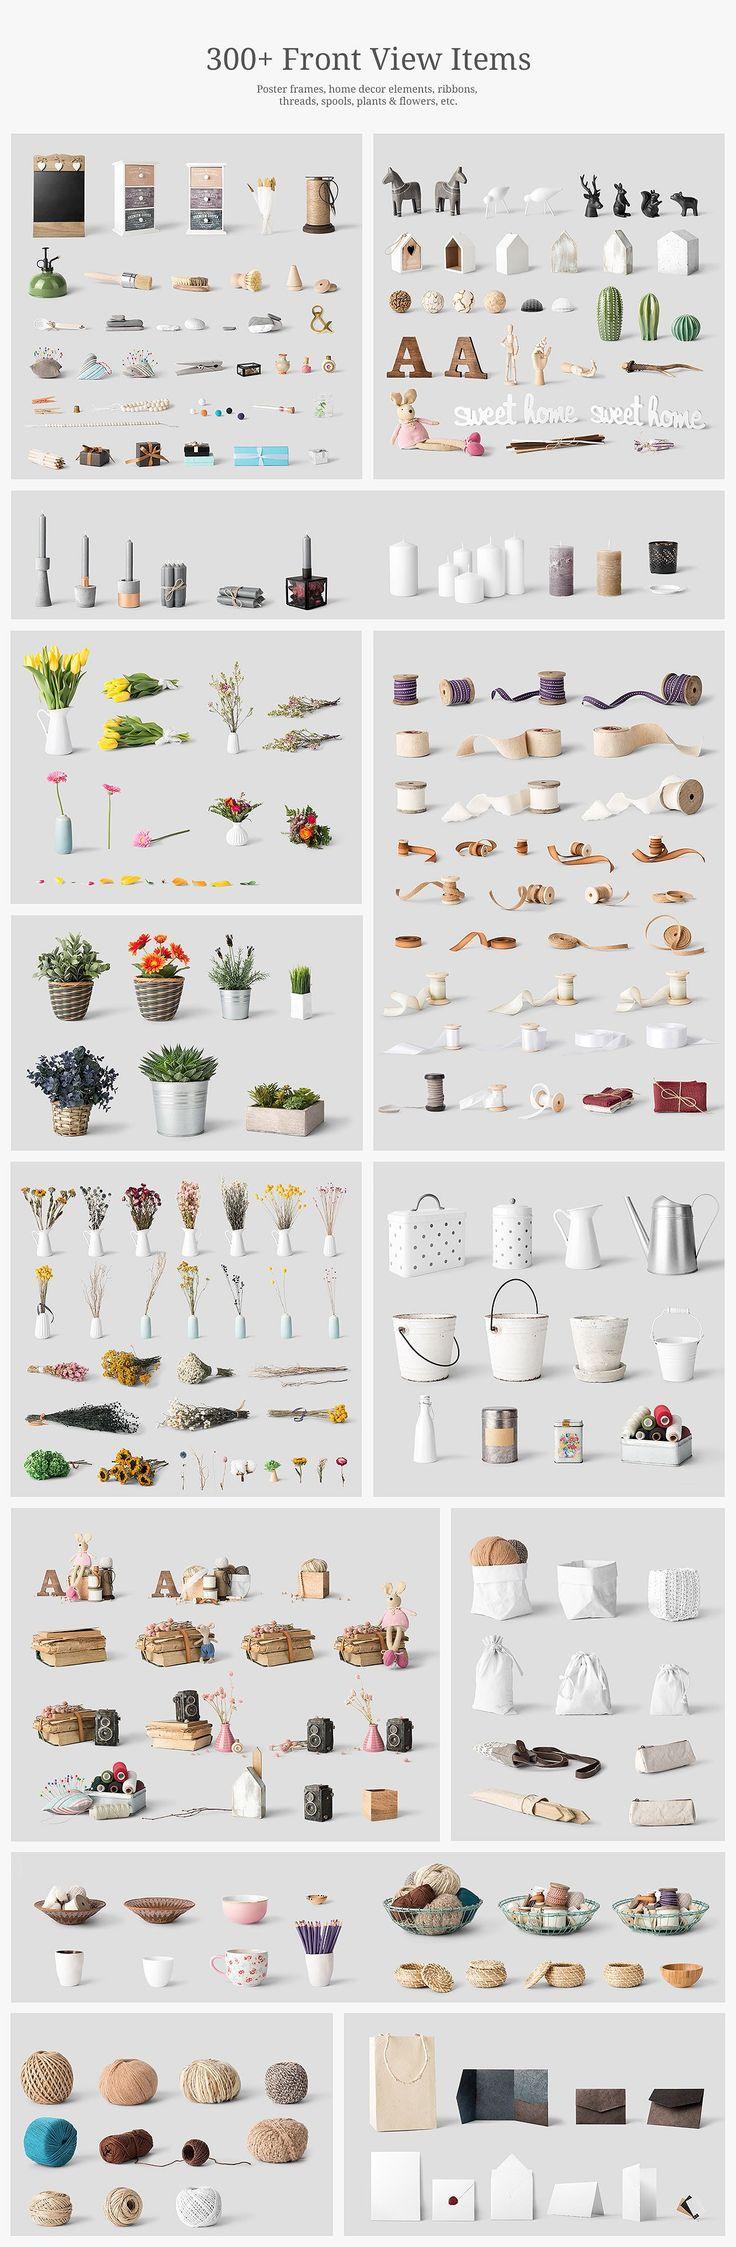 Simple Homes Mockup Creator by Mockup Cloud on @creativemarket #ad